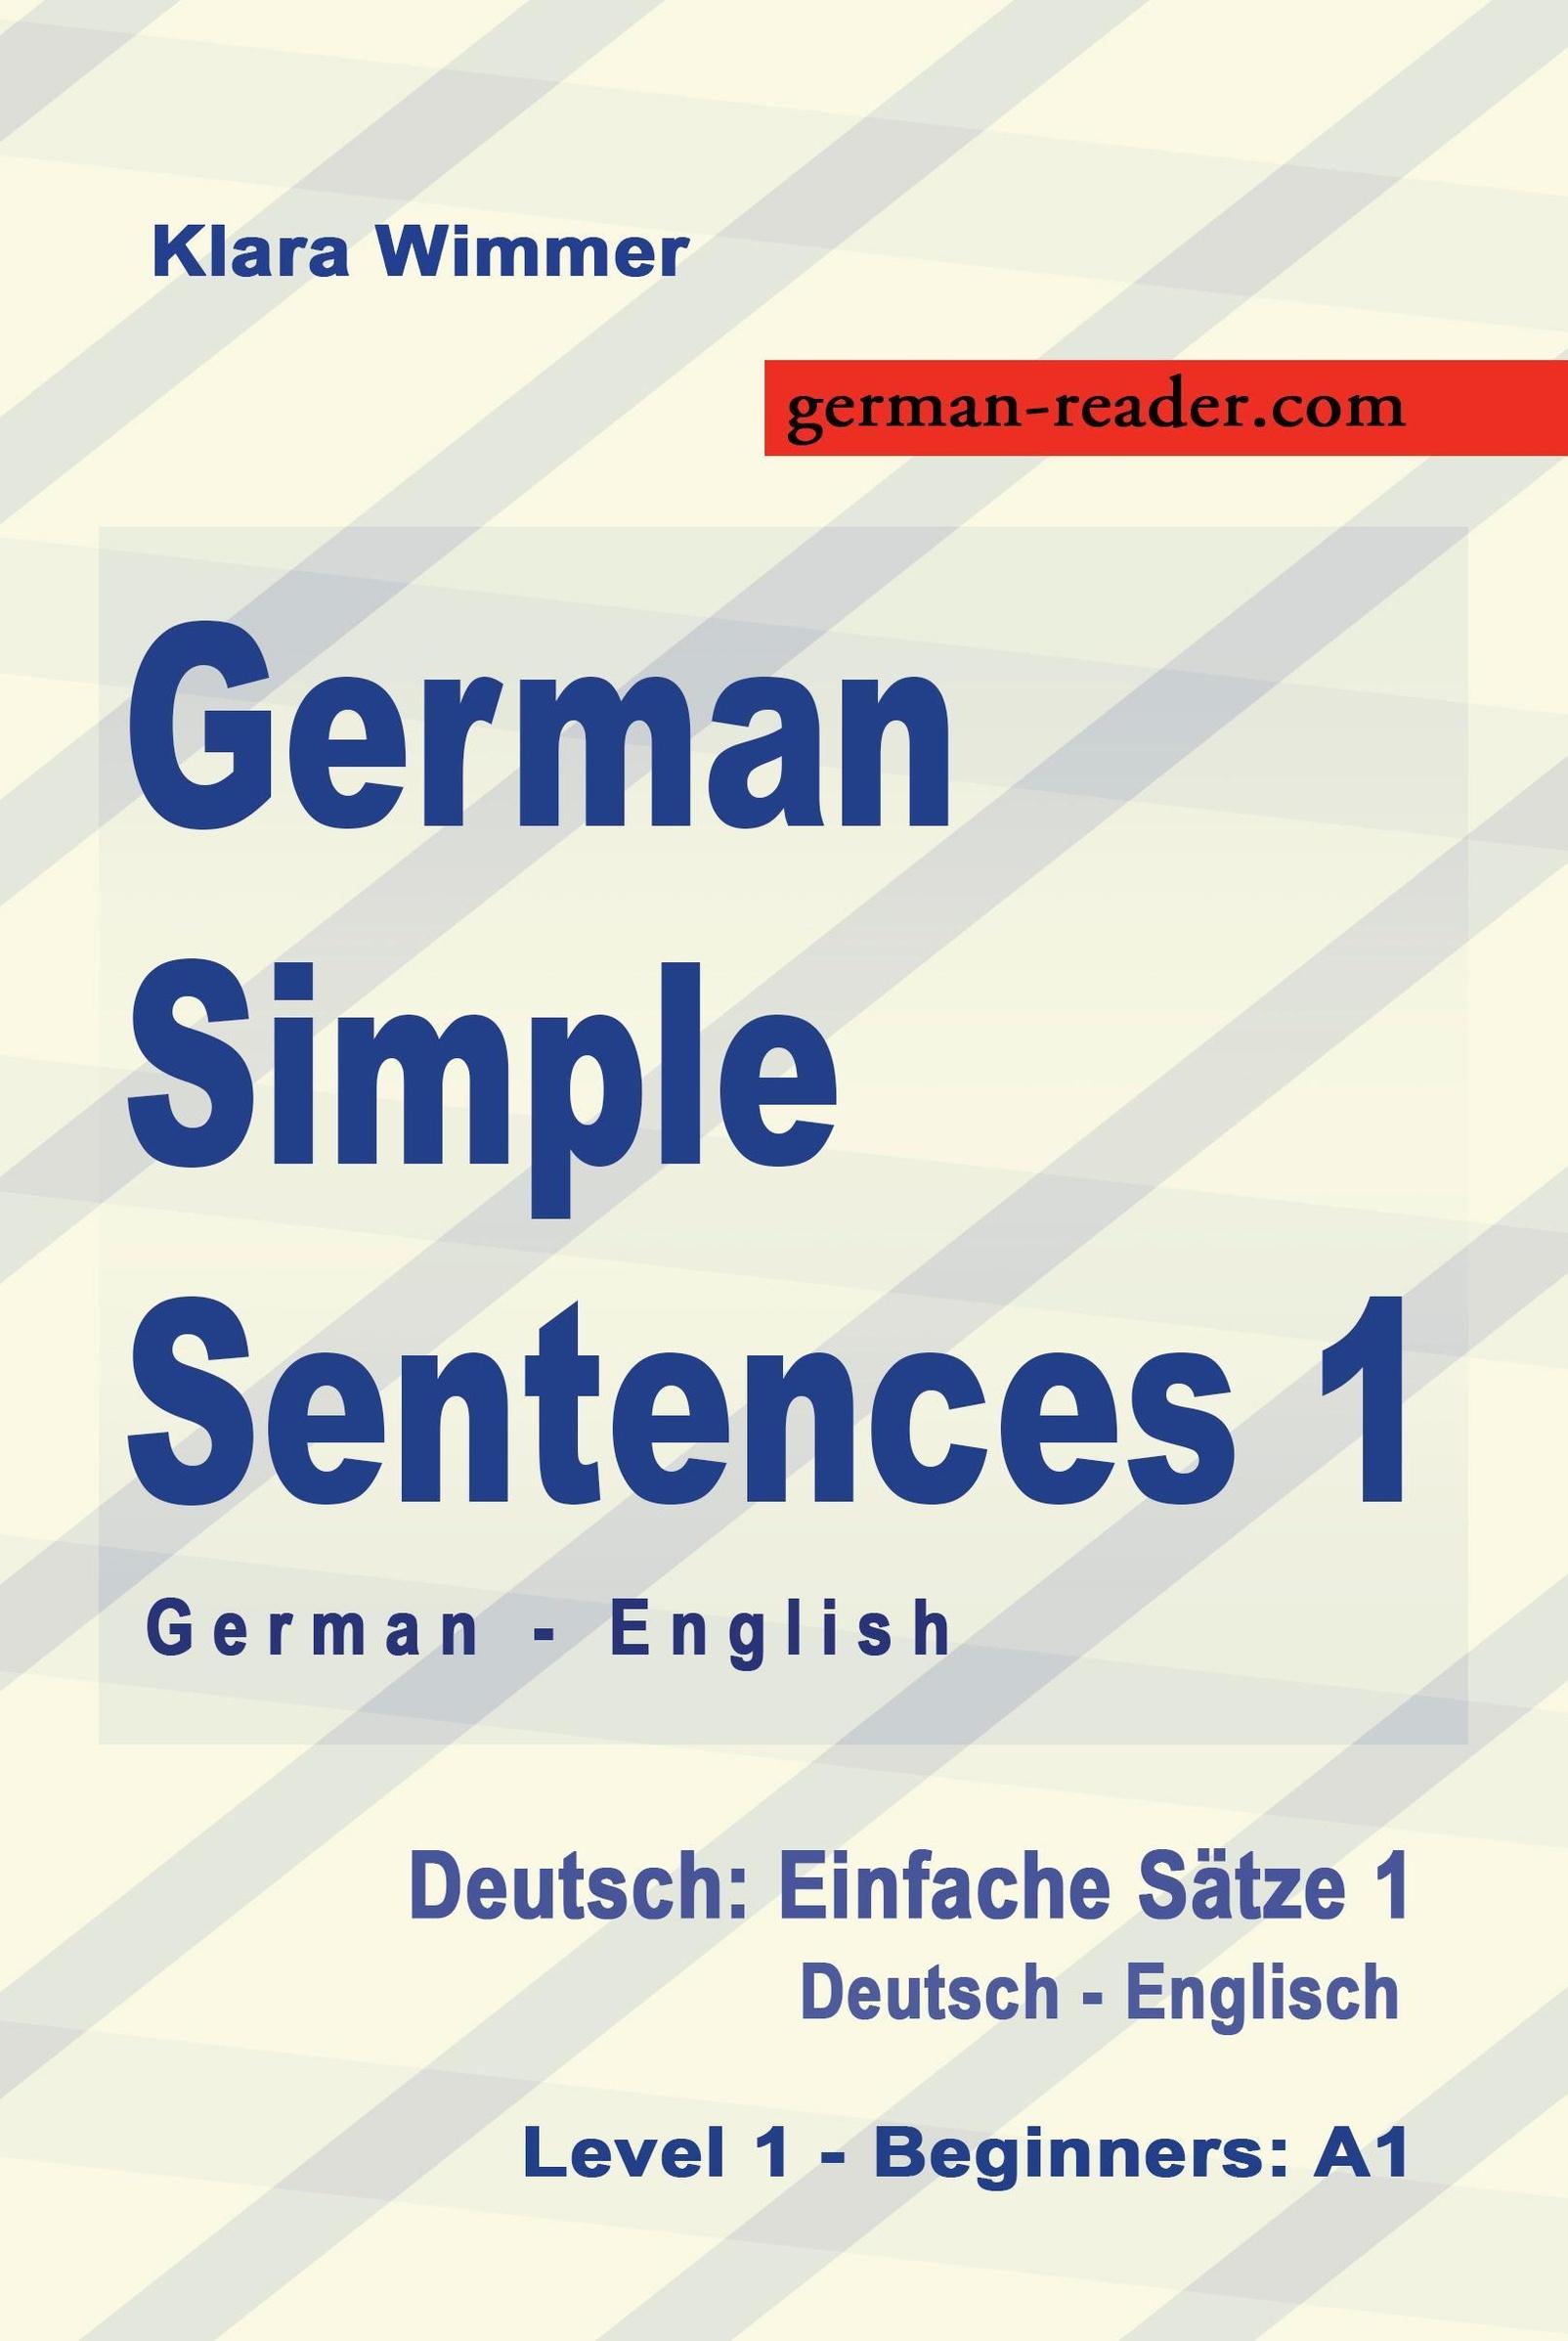 German Simple Sentences 20, German English, Level 20   Beginners A20 ...